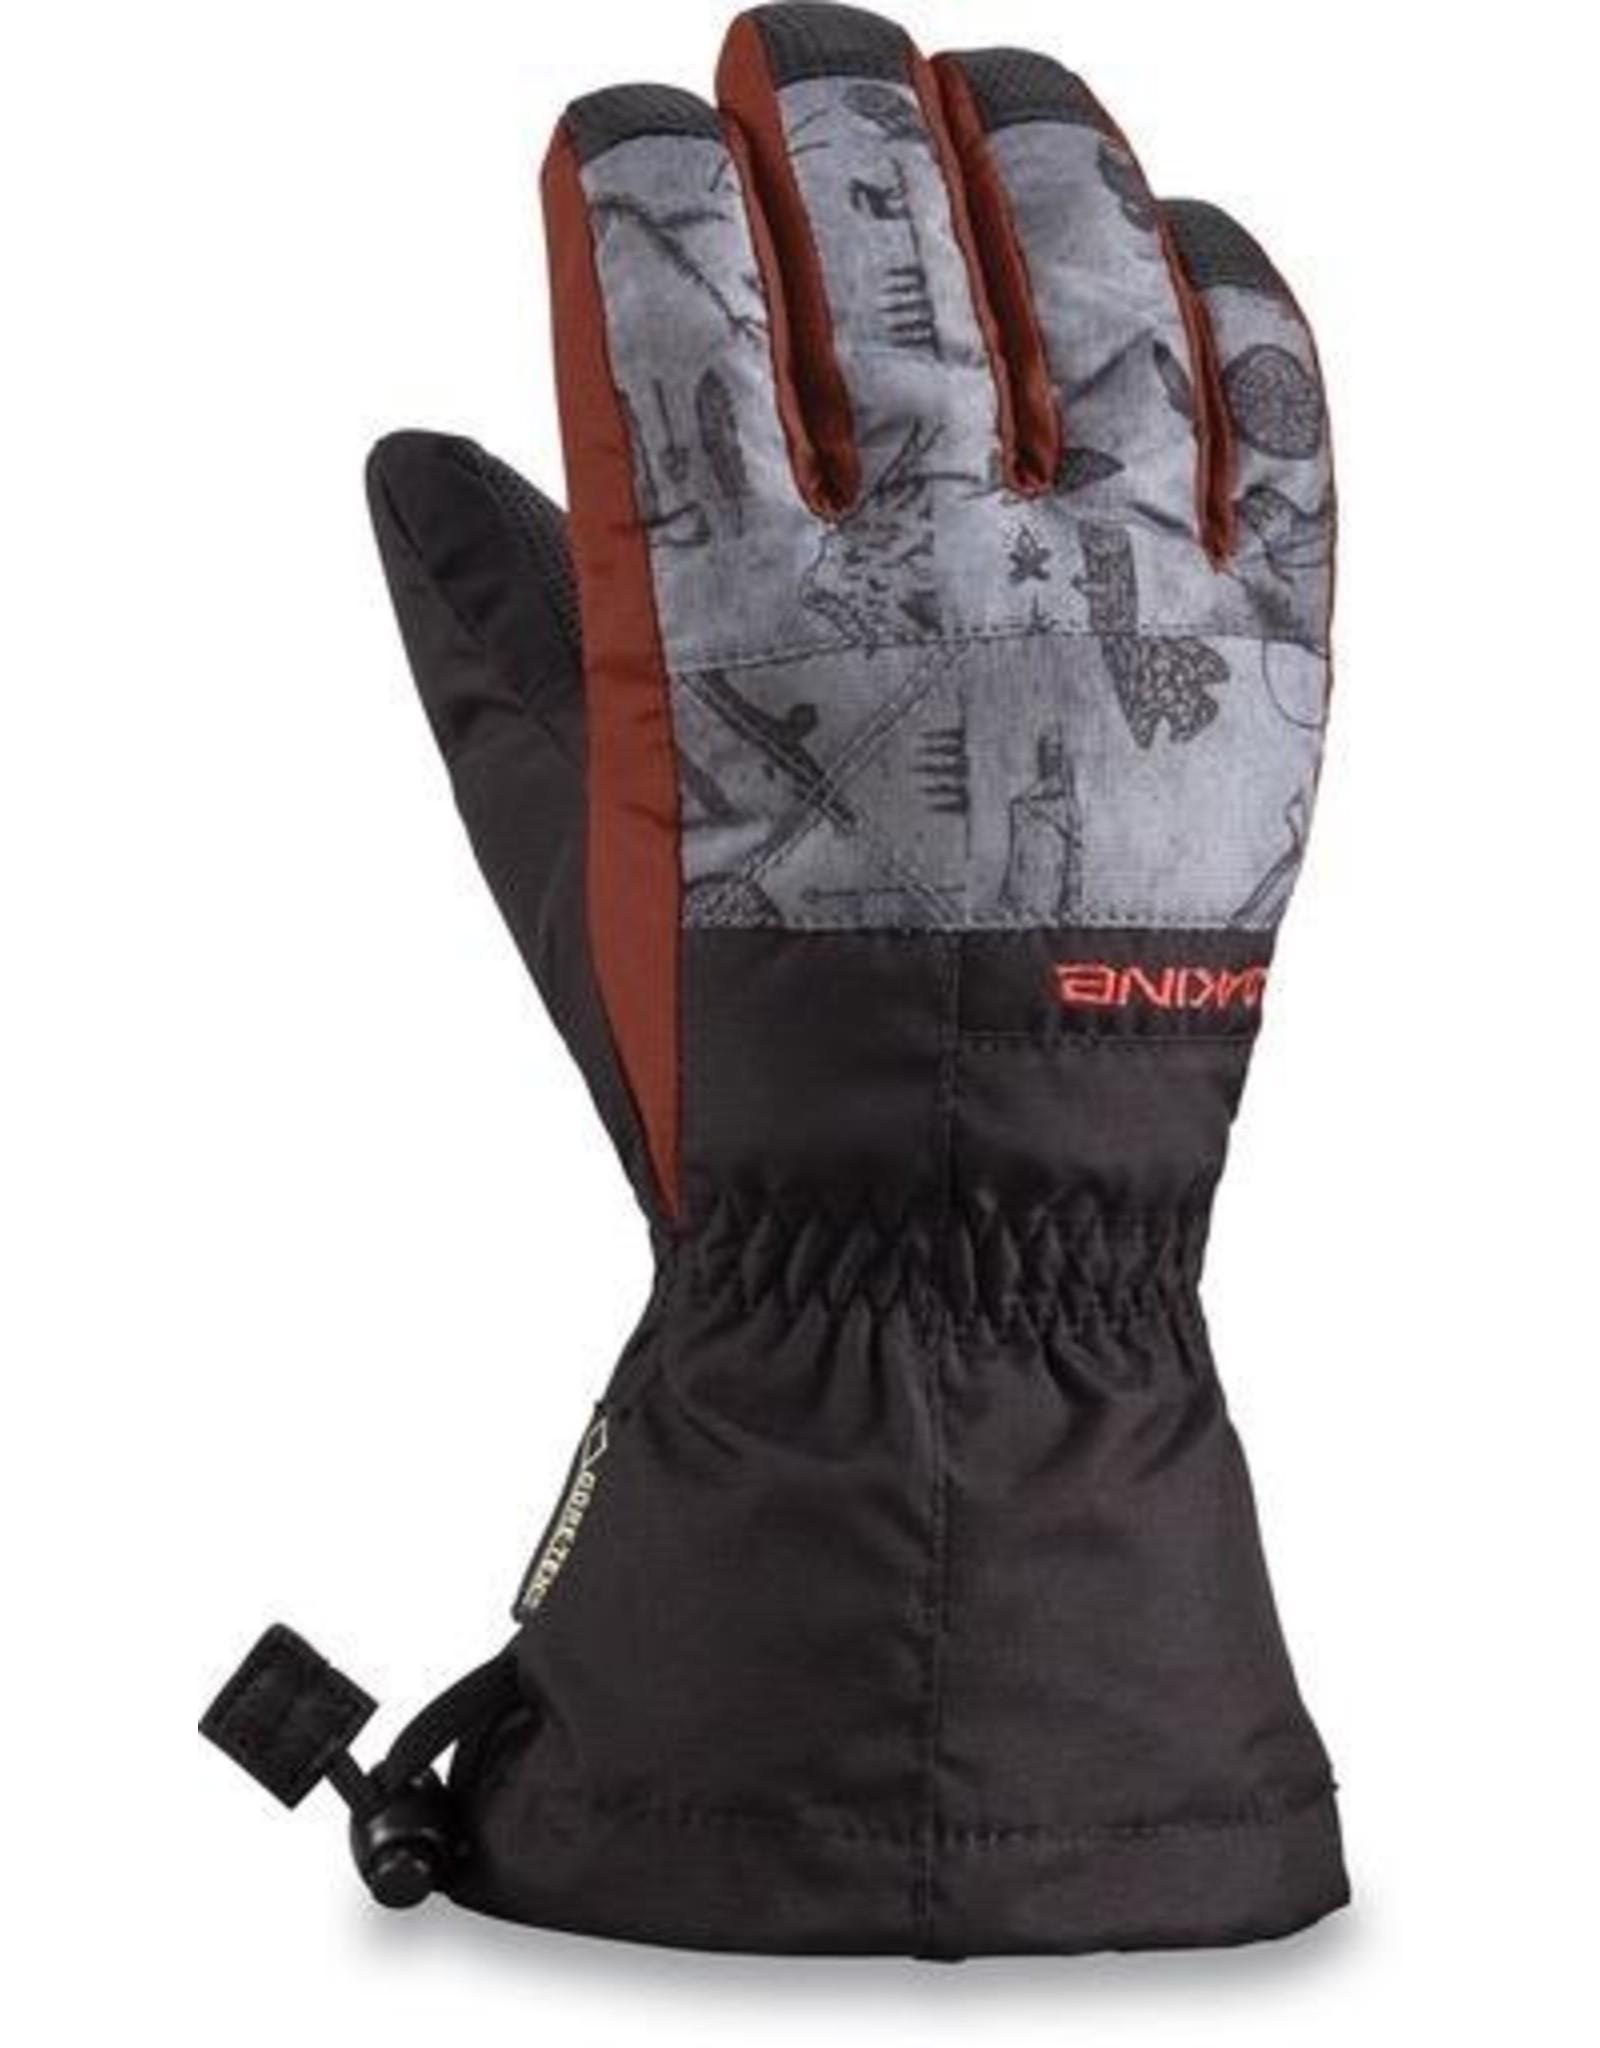 Dakine Dakine - Avenger Jr. Glove - K/XL - Northwoods